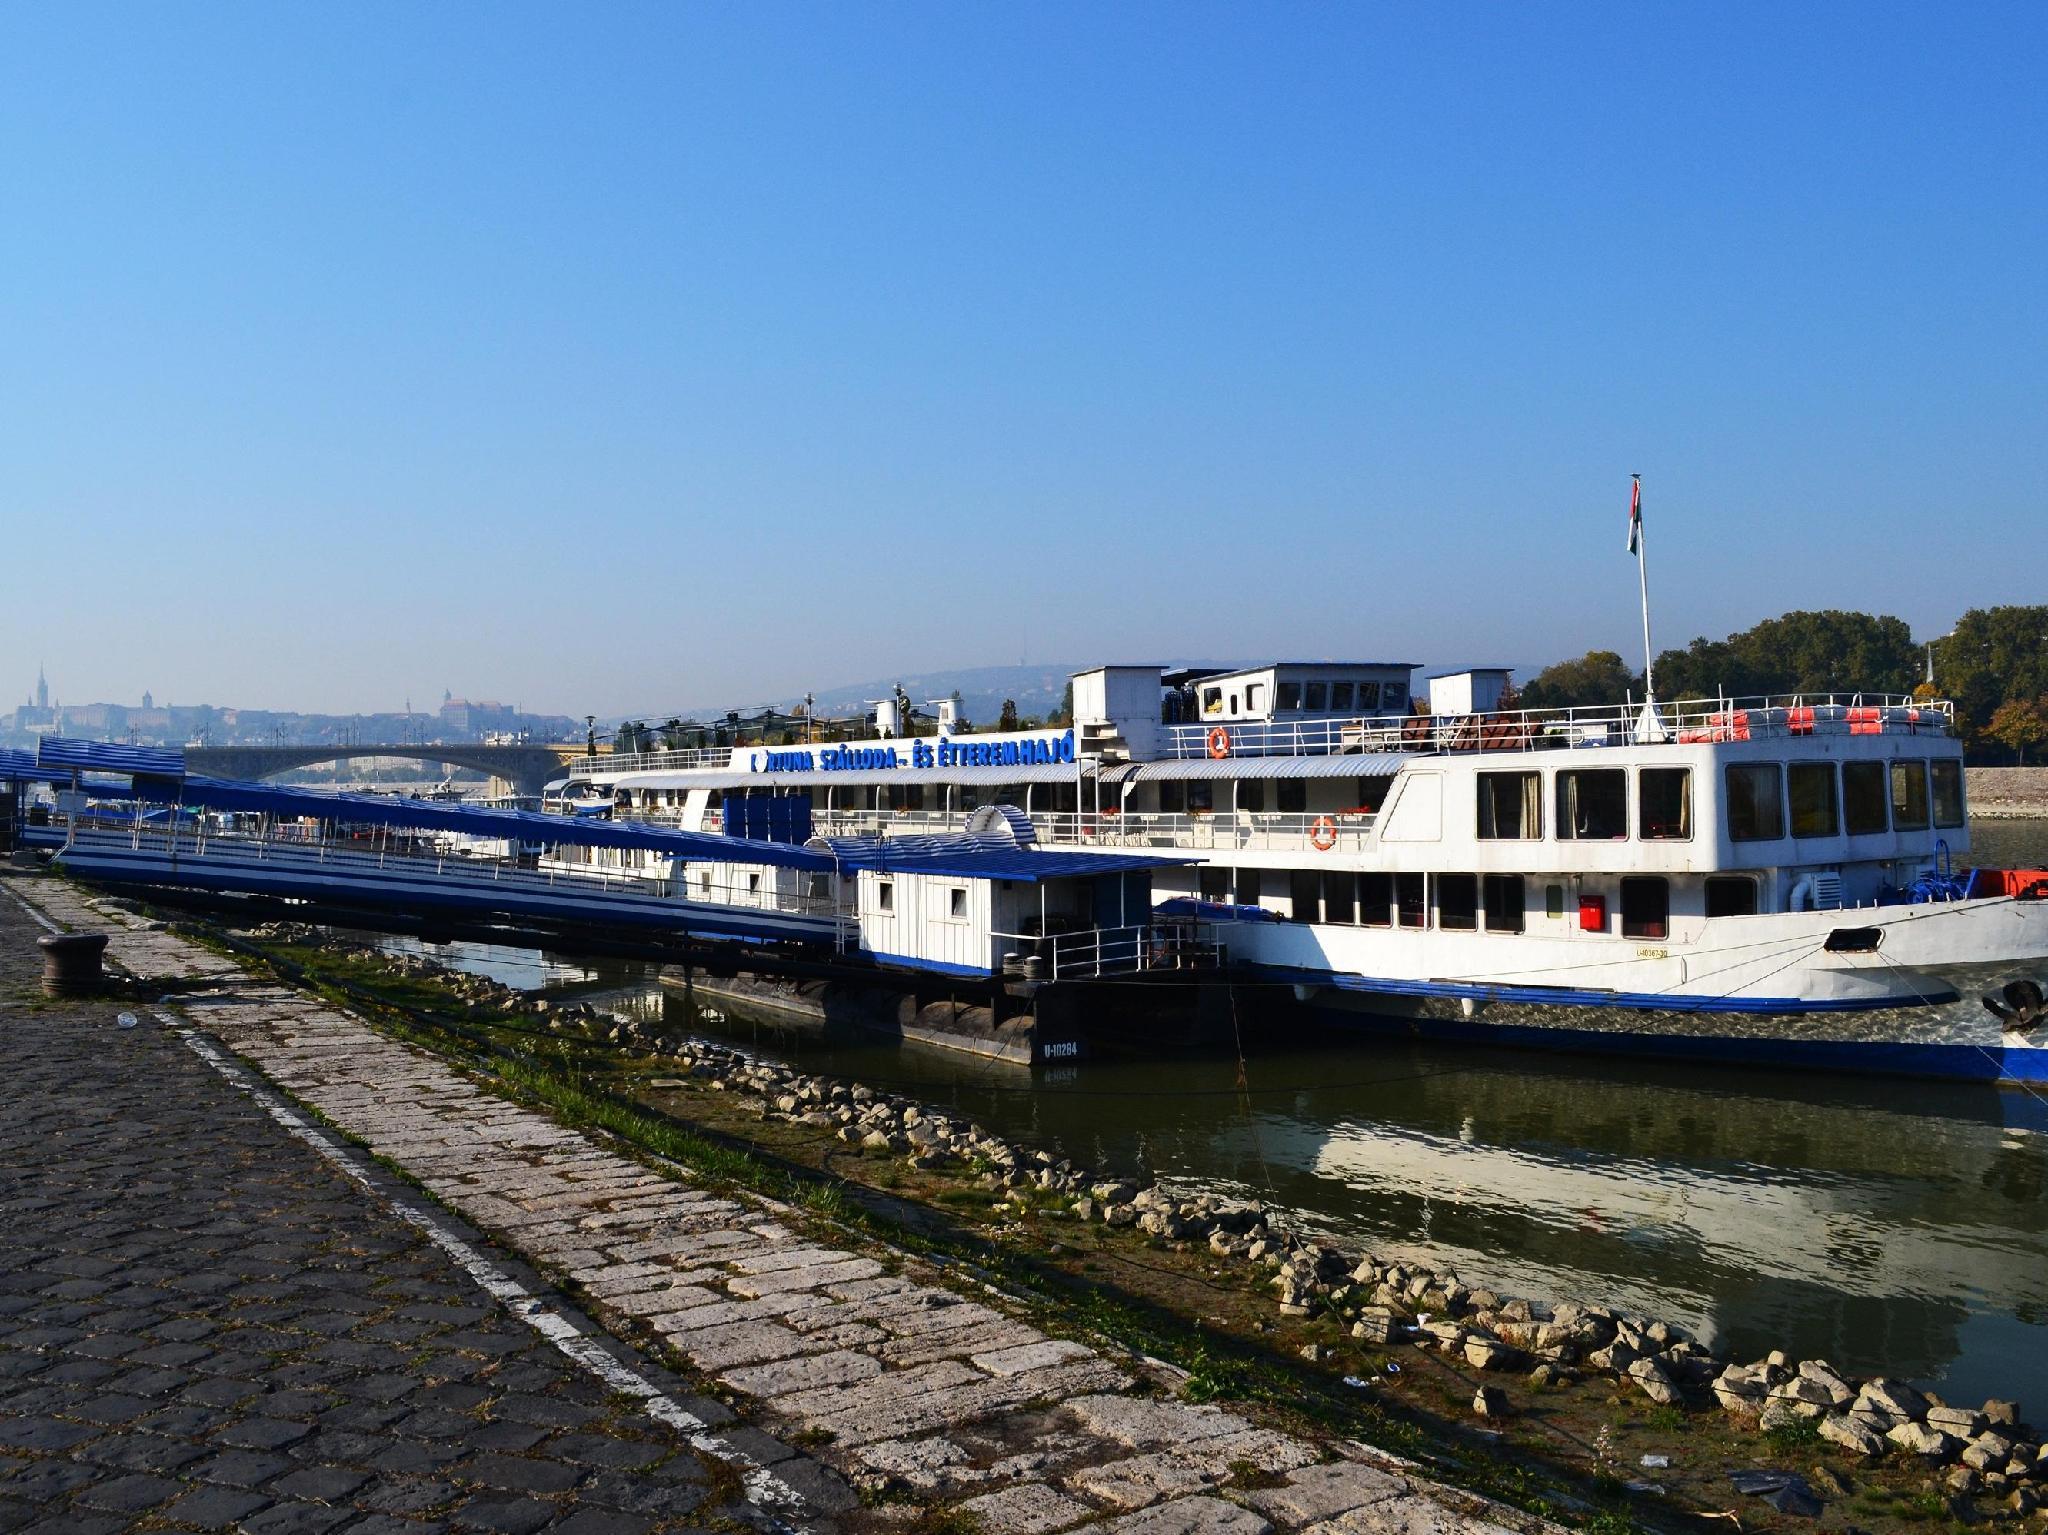 Fortuna Boat Hostel